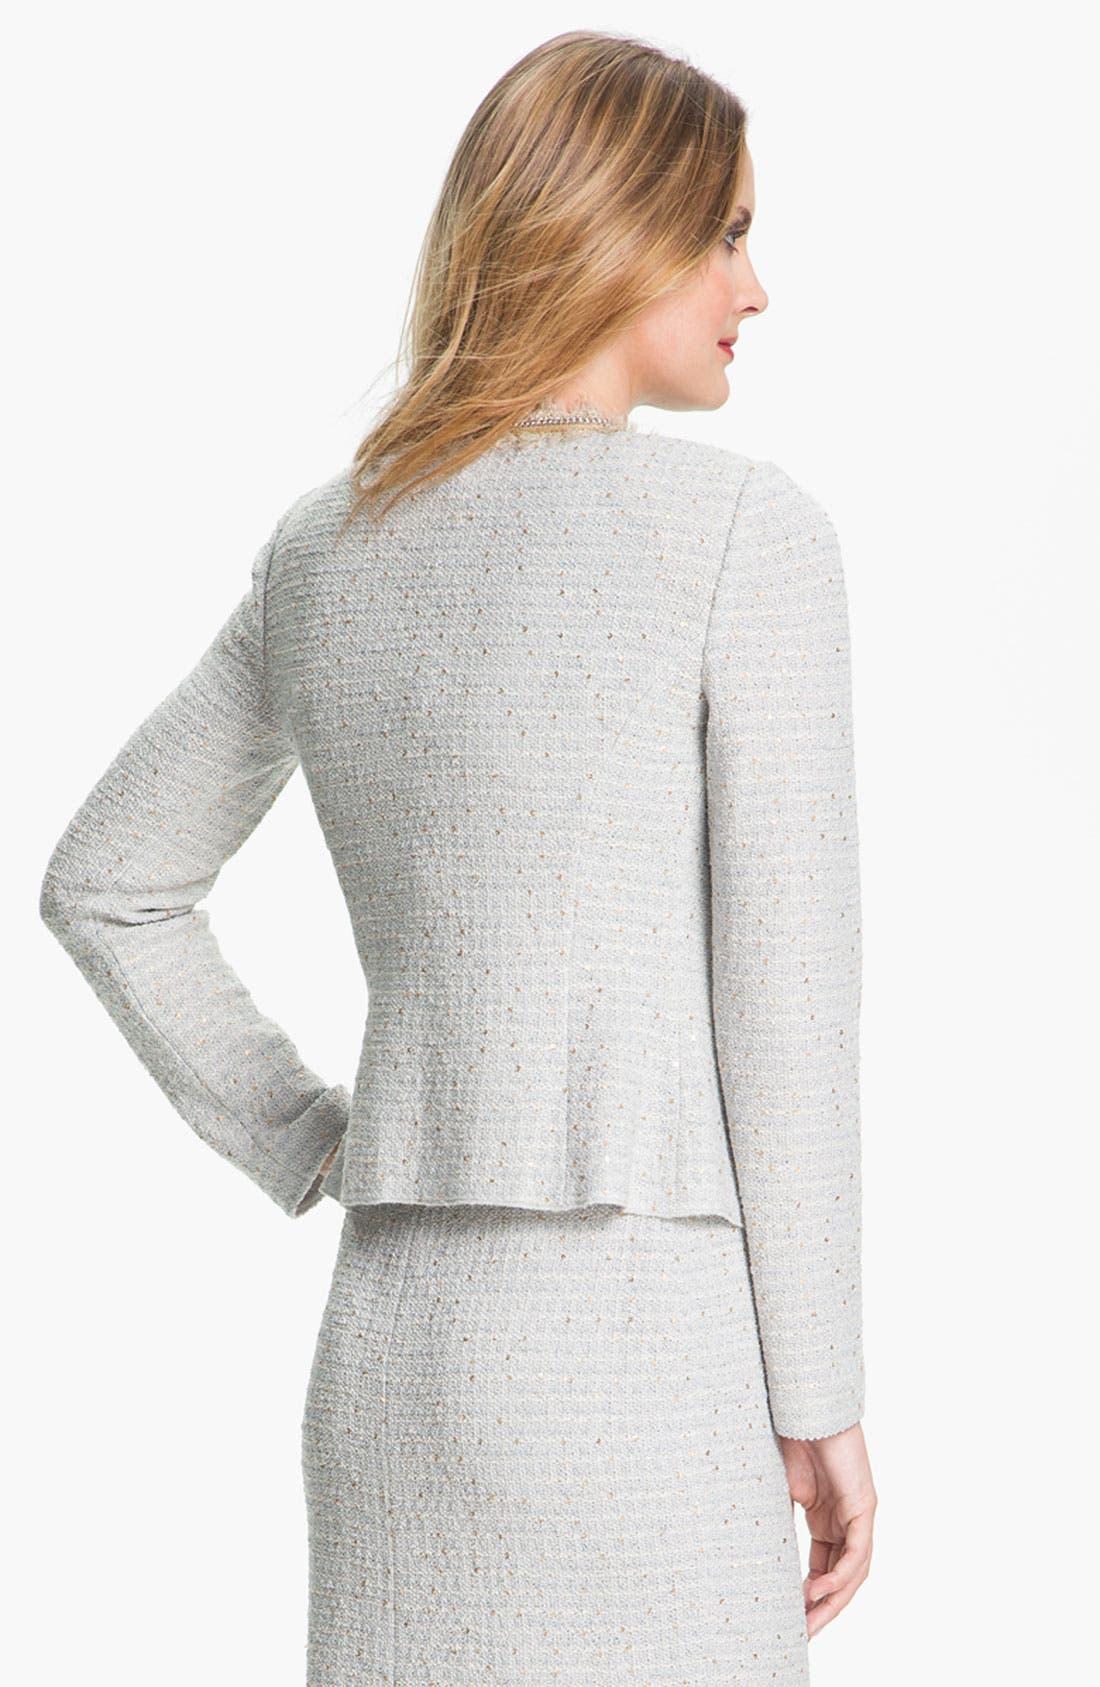 Alternate Image 3  - St. John Collection Sequin Ice Tweed Knit Jacket